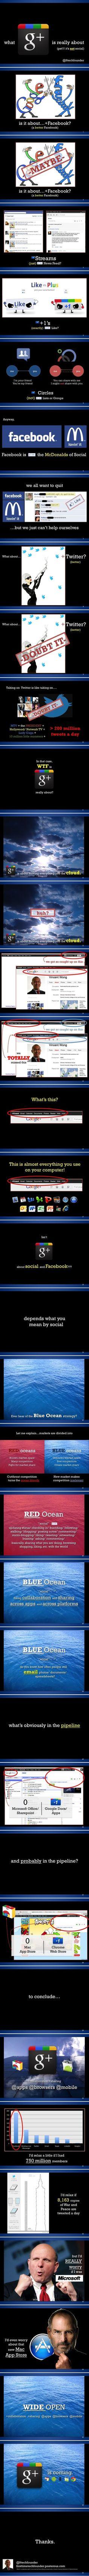 ¿Qué es realmente Google +? #infografia #infographic #socialmedia #humor